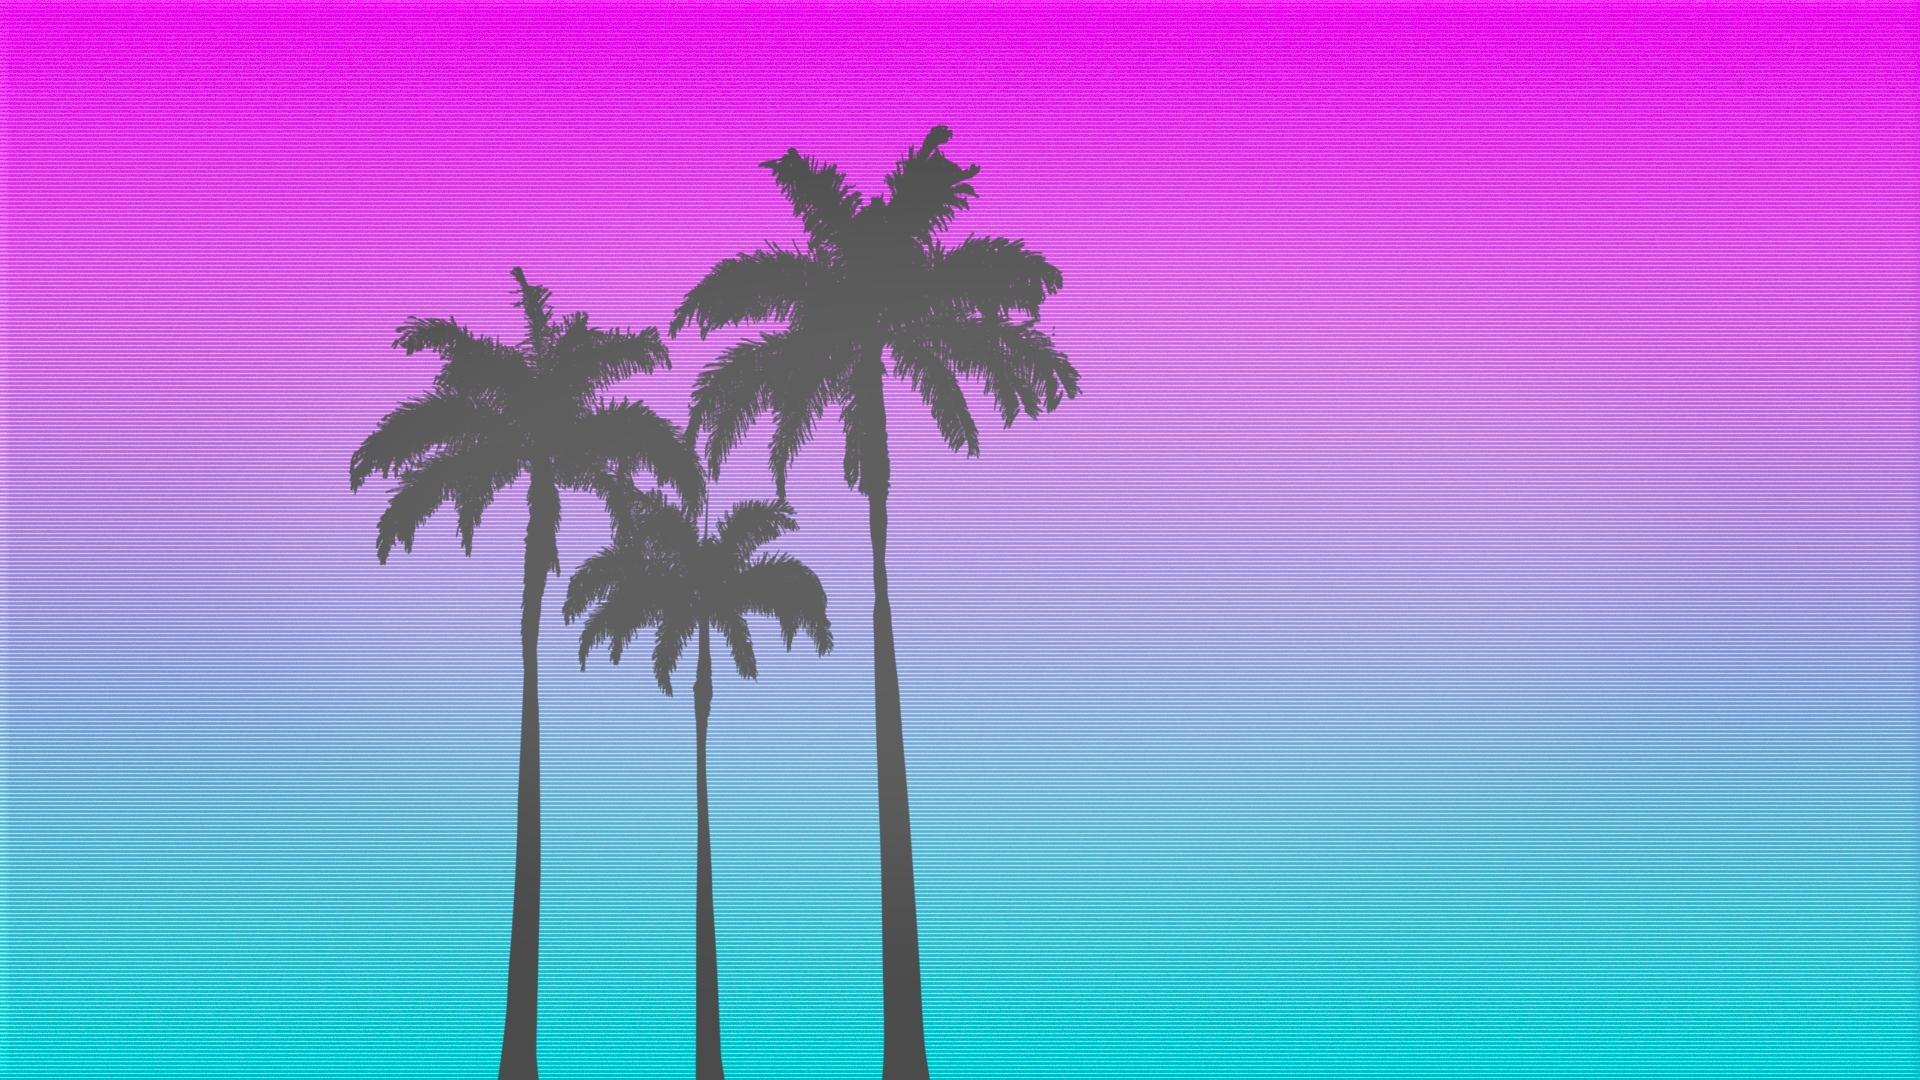 Hotline Miami Wallpapers Hd For Desktop Backgrounds